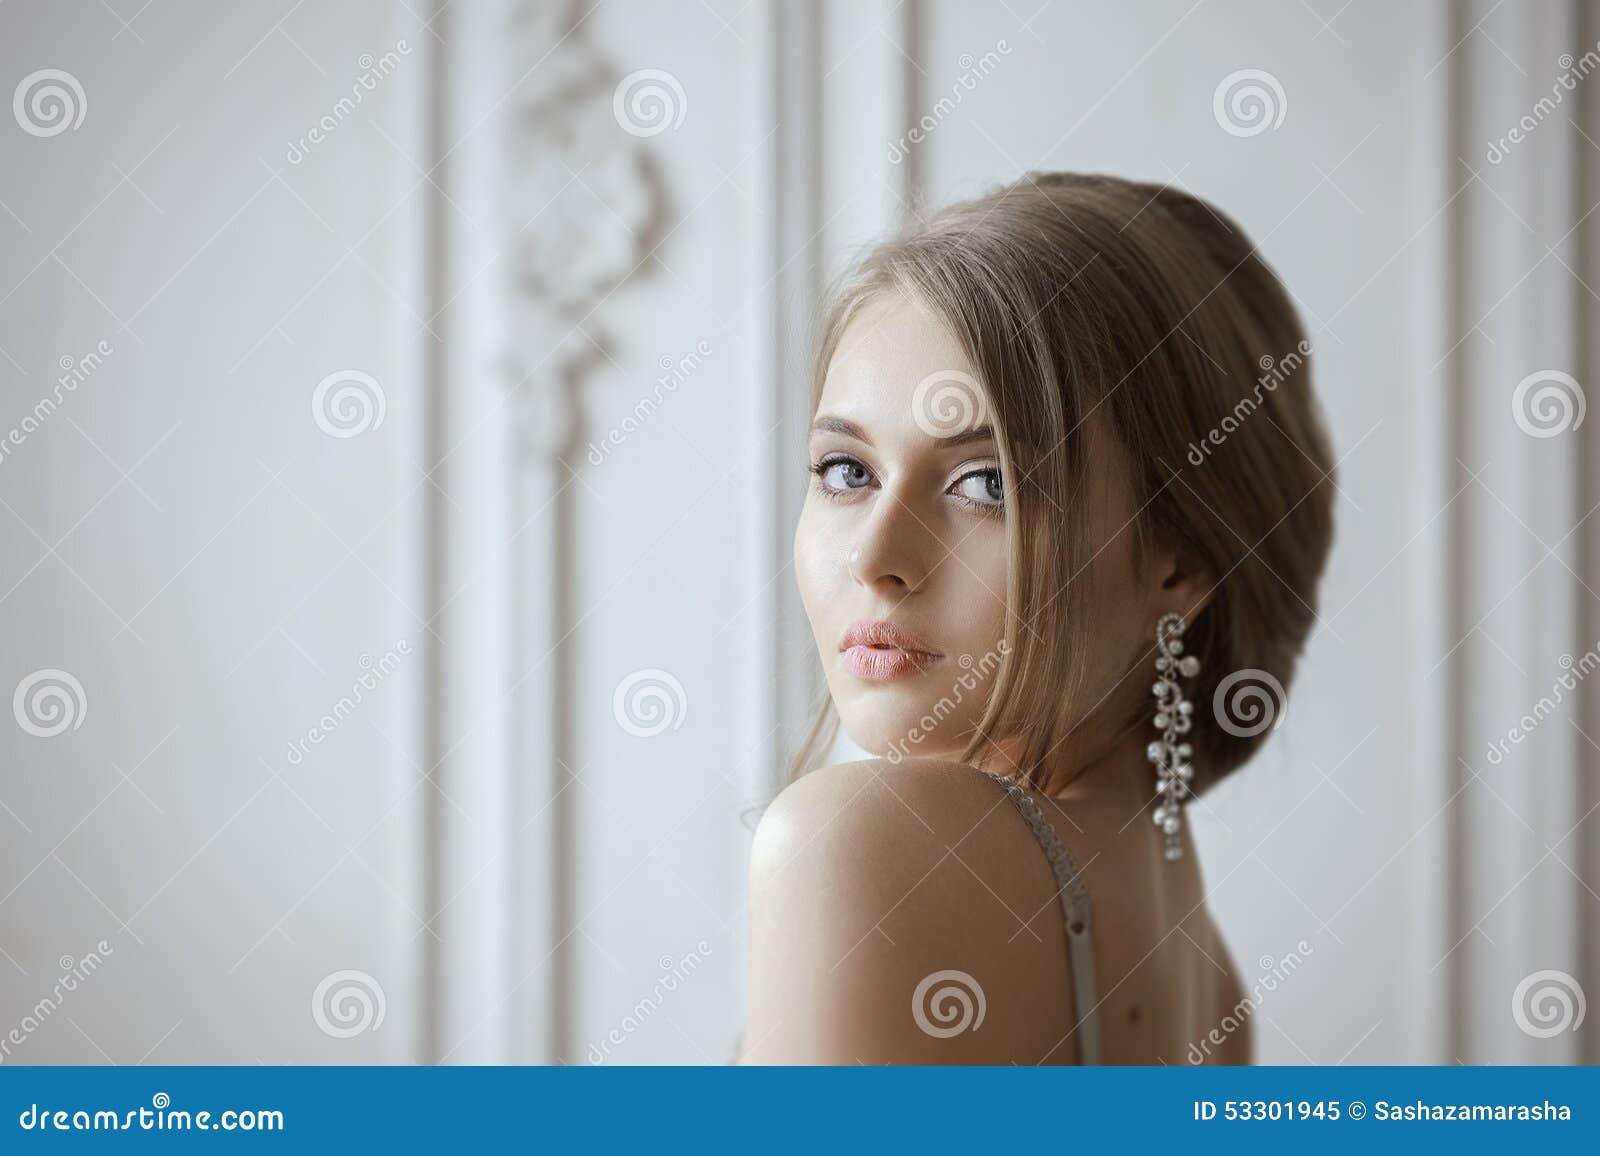 Beautiful Blonde Bride Portrait Wedding Makeup Stock Image - Image ...